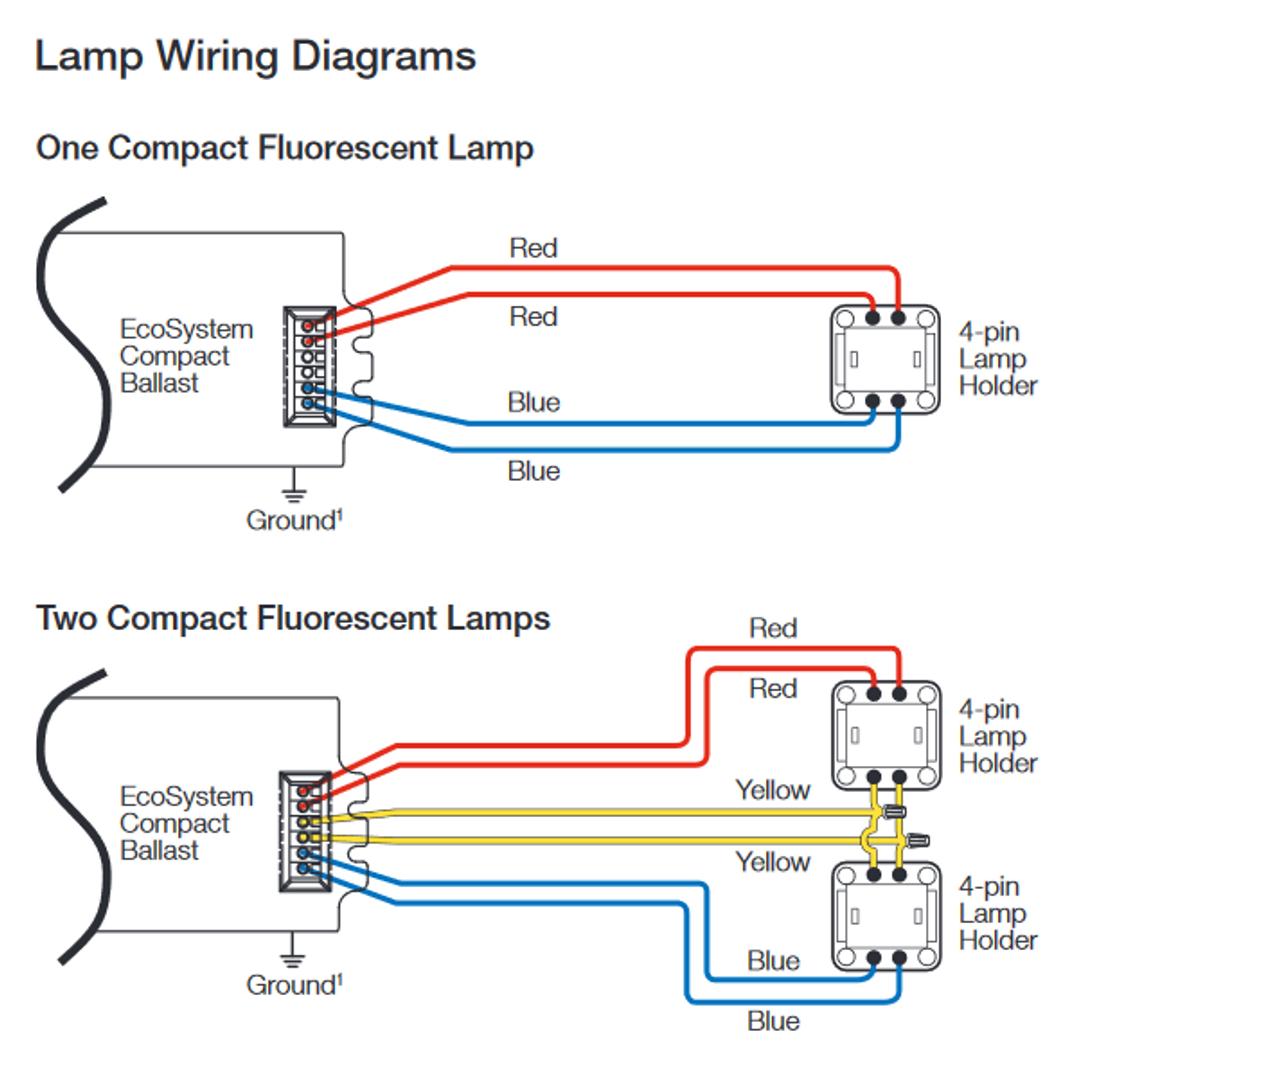 4 Pin Light Bulb Wiring - Creative Wiring Diagram Ideas Light Bulb Wiring on